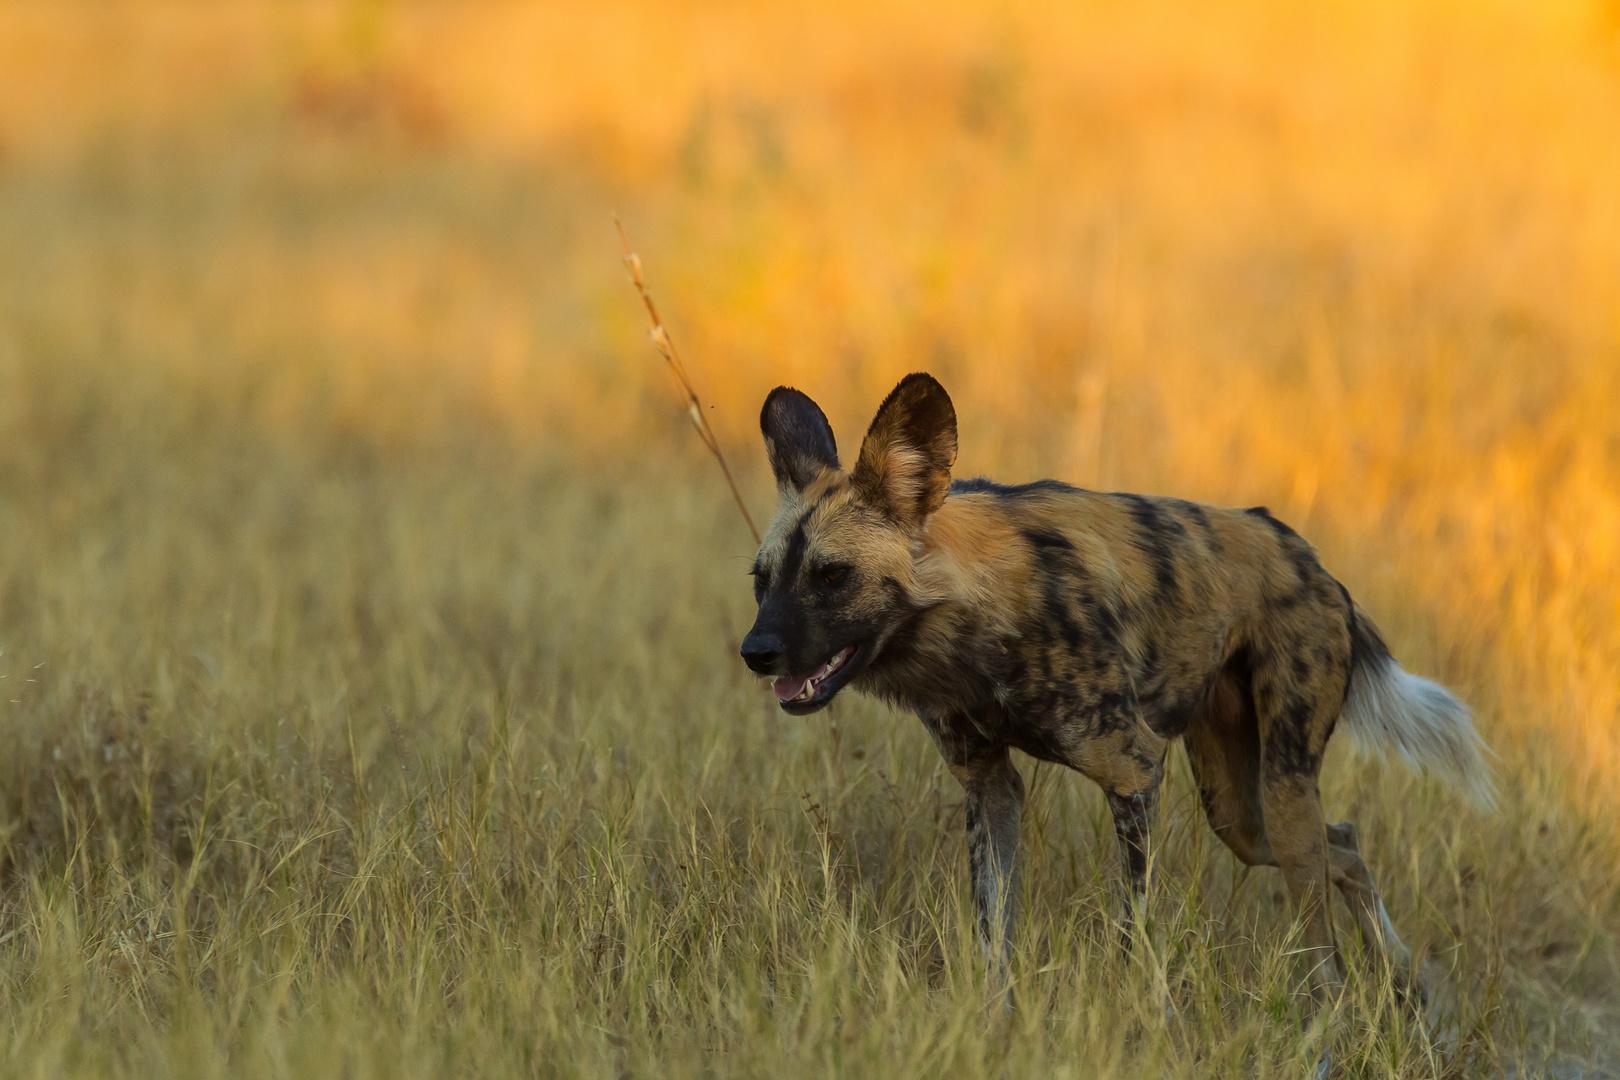 Wildhund - Wild Dog - Khwai-Region, Botswana